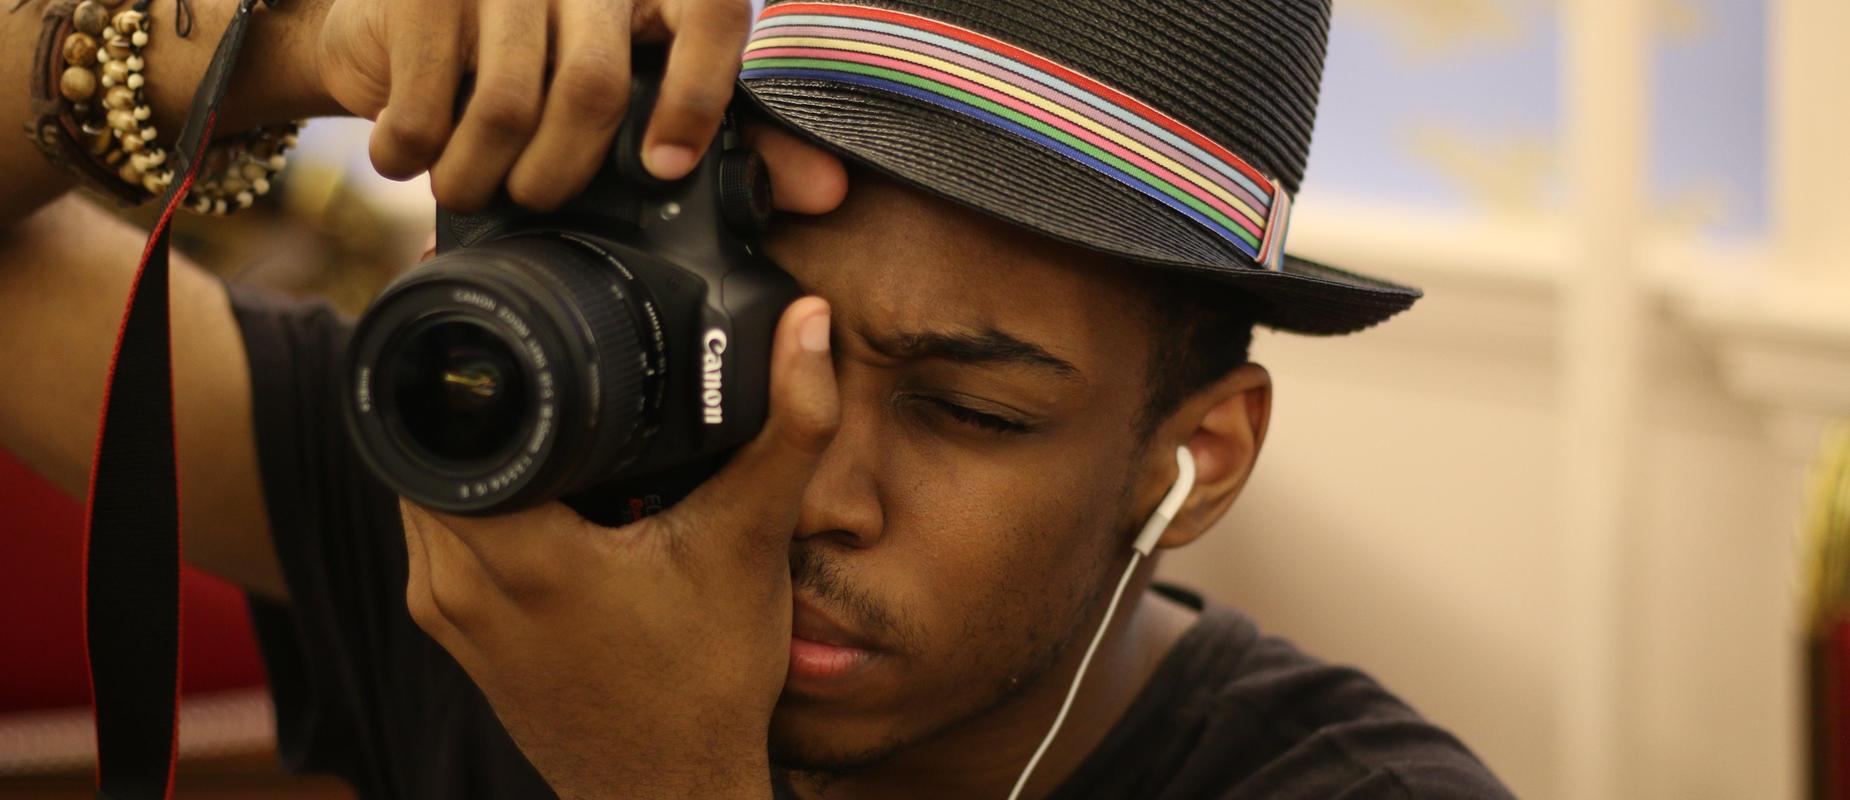 Student photographer B. Nixon hard at work.